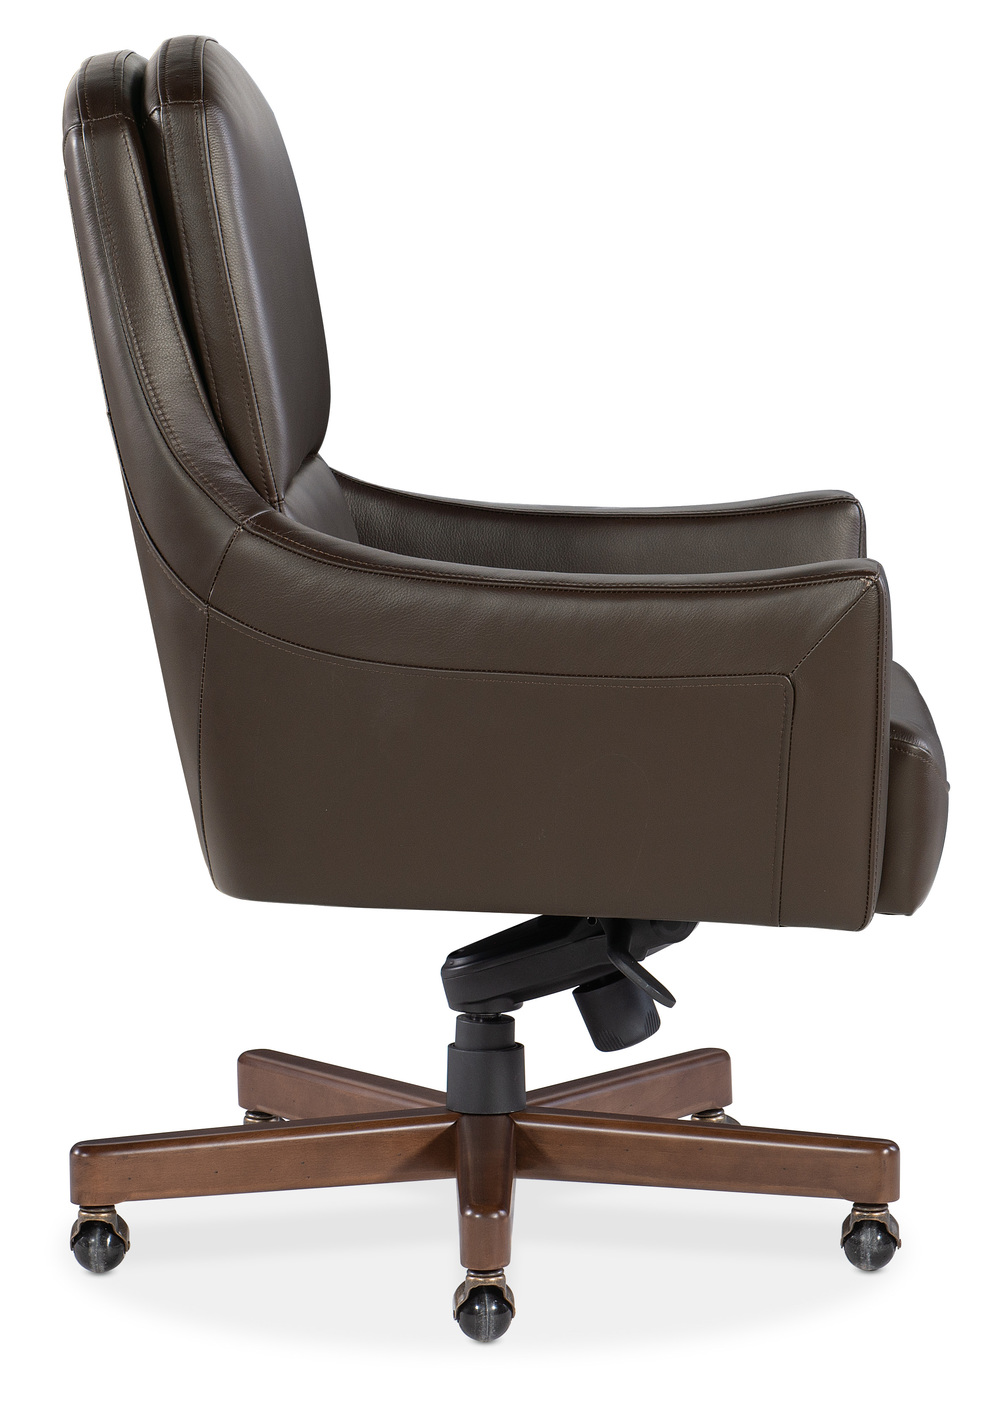 Hooker Furniture - Wasila Executive Swivel Tilt Chair